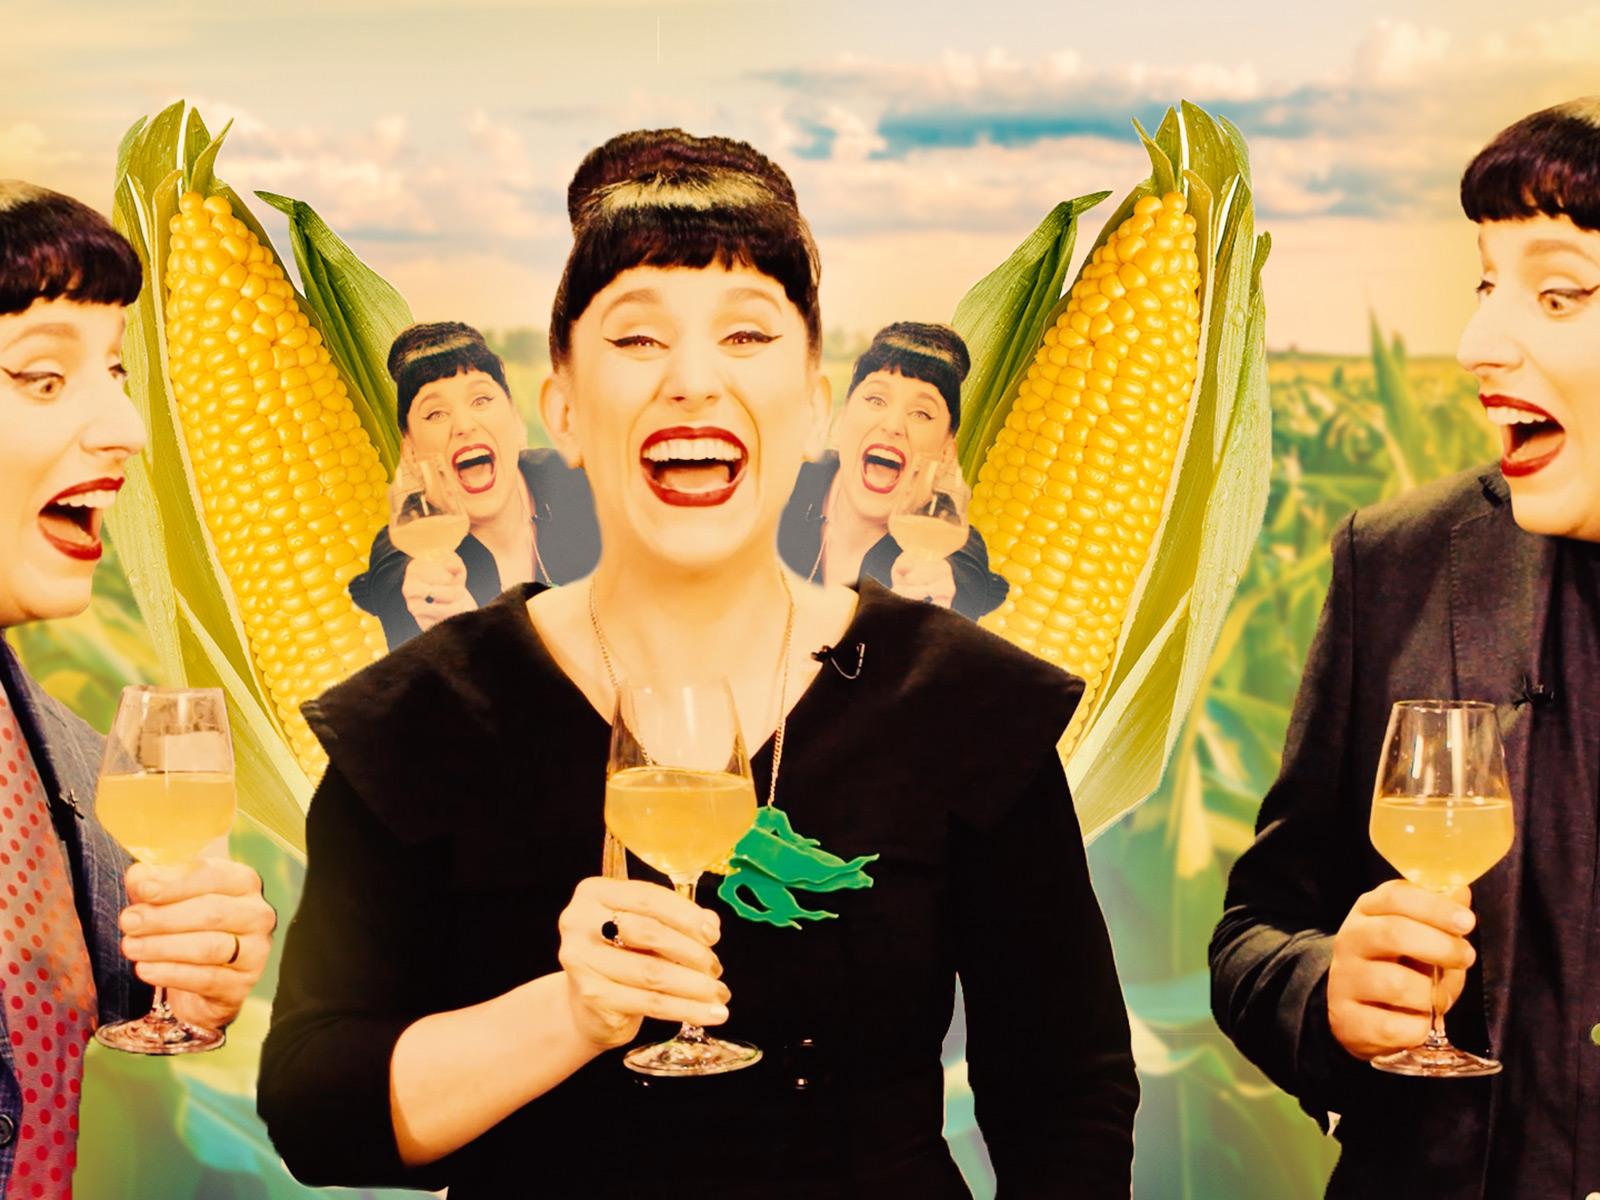 corn-cob-wine-hero.jpg